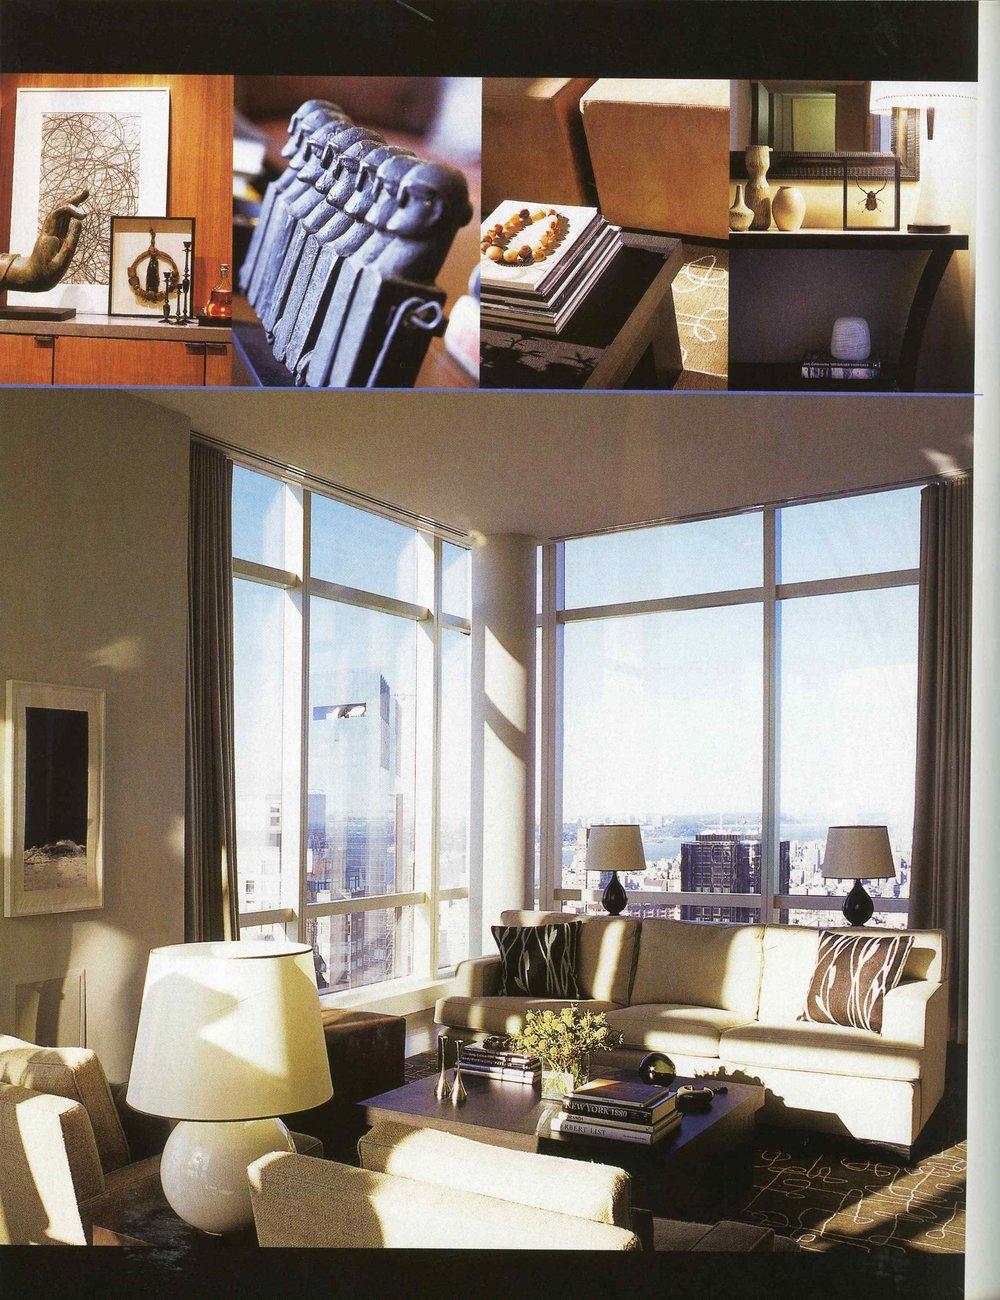 Interior Design_Jan 06_Full Article_Page_4.jpg